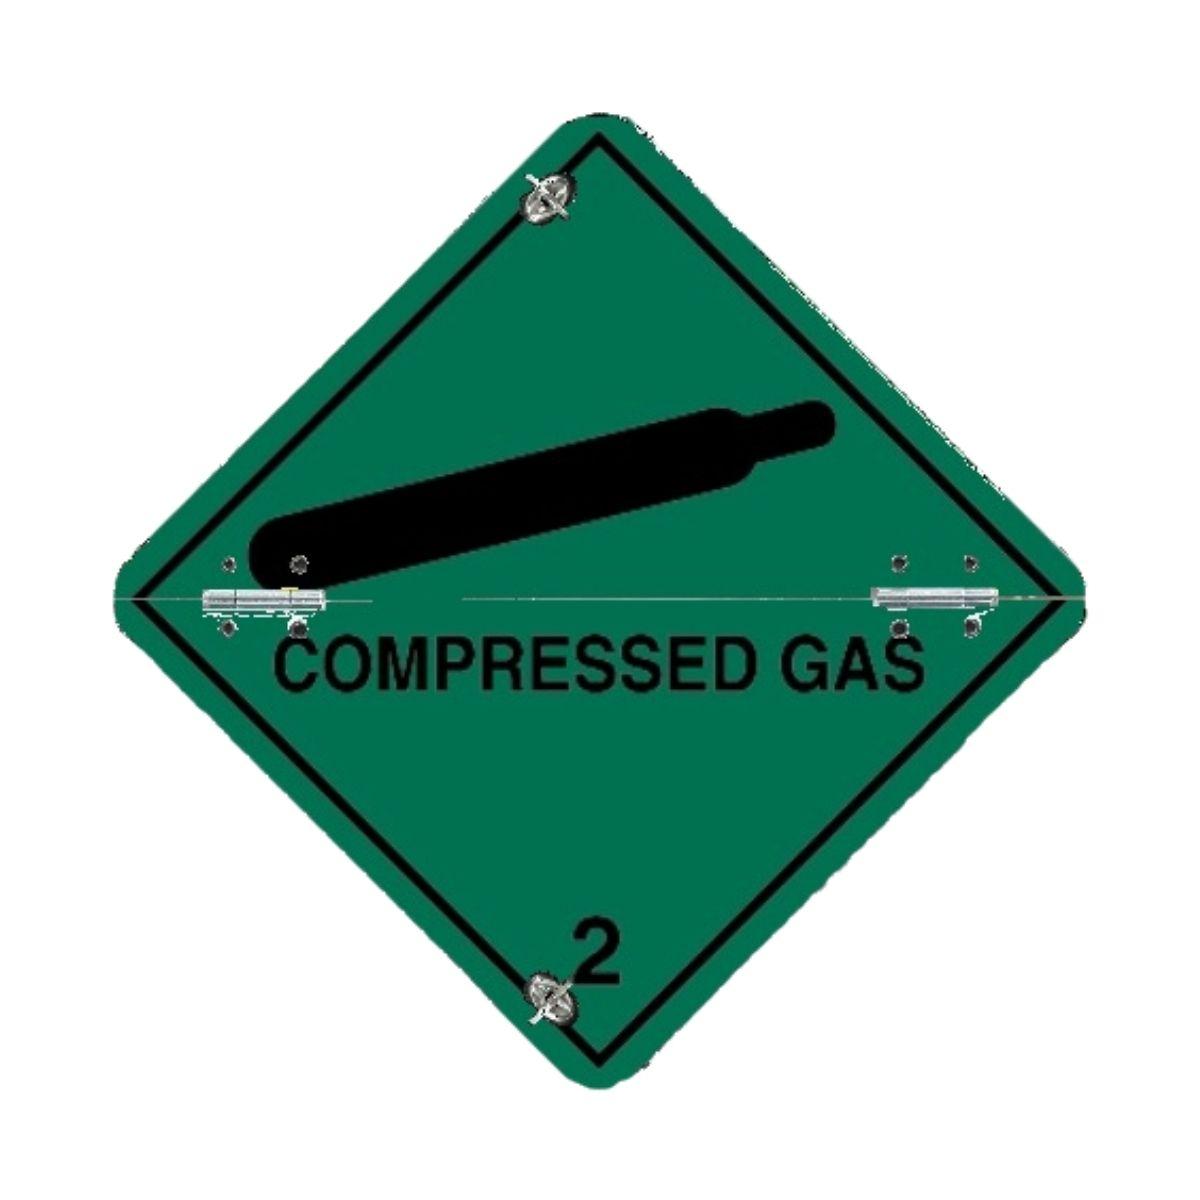 VS7210 Class 2 Compressed Gas Folding Diamonds 250 x 250mm